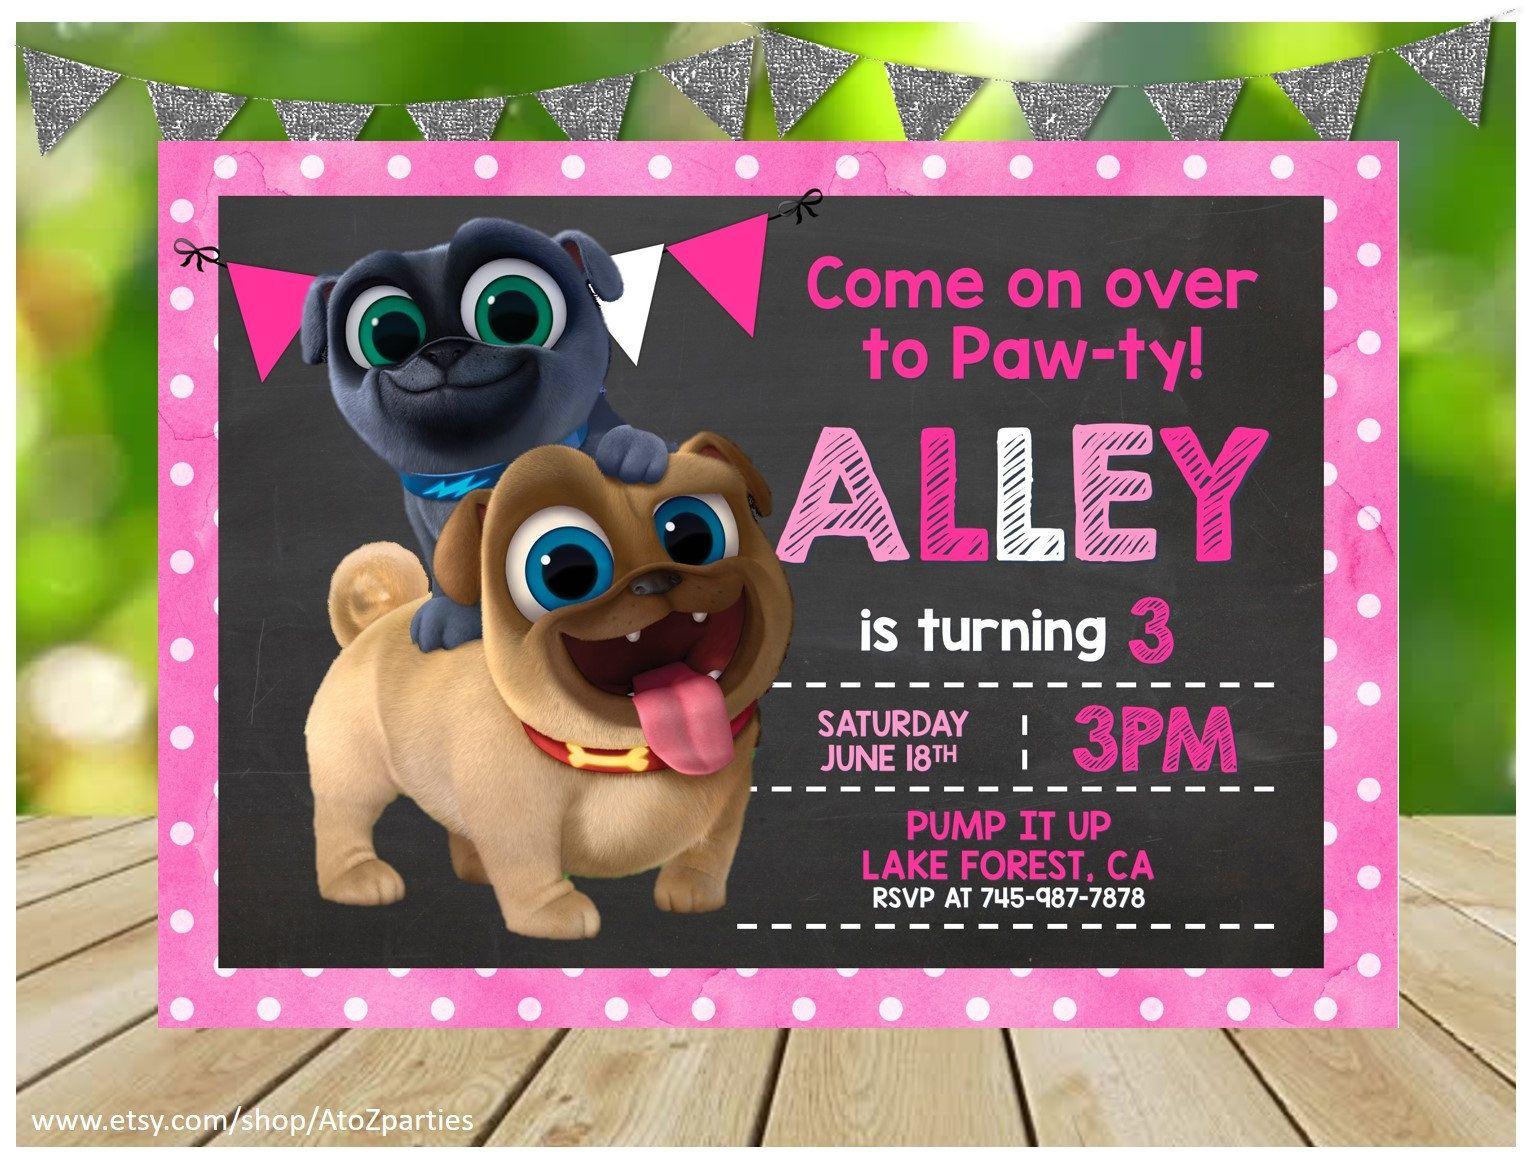 Puppy Dog Pals Invitation Puppy Dog Pals Birthday Printable Invitation 5x7 Print At Home Chalkboard Invitation Pink Invitations Birthday Printables